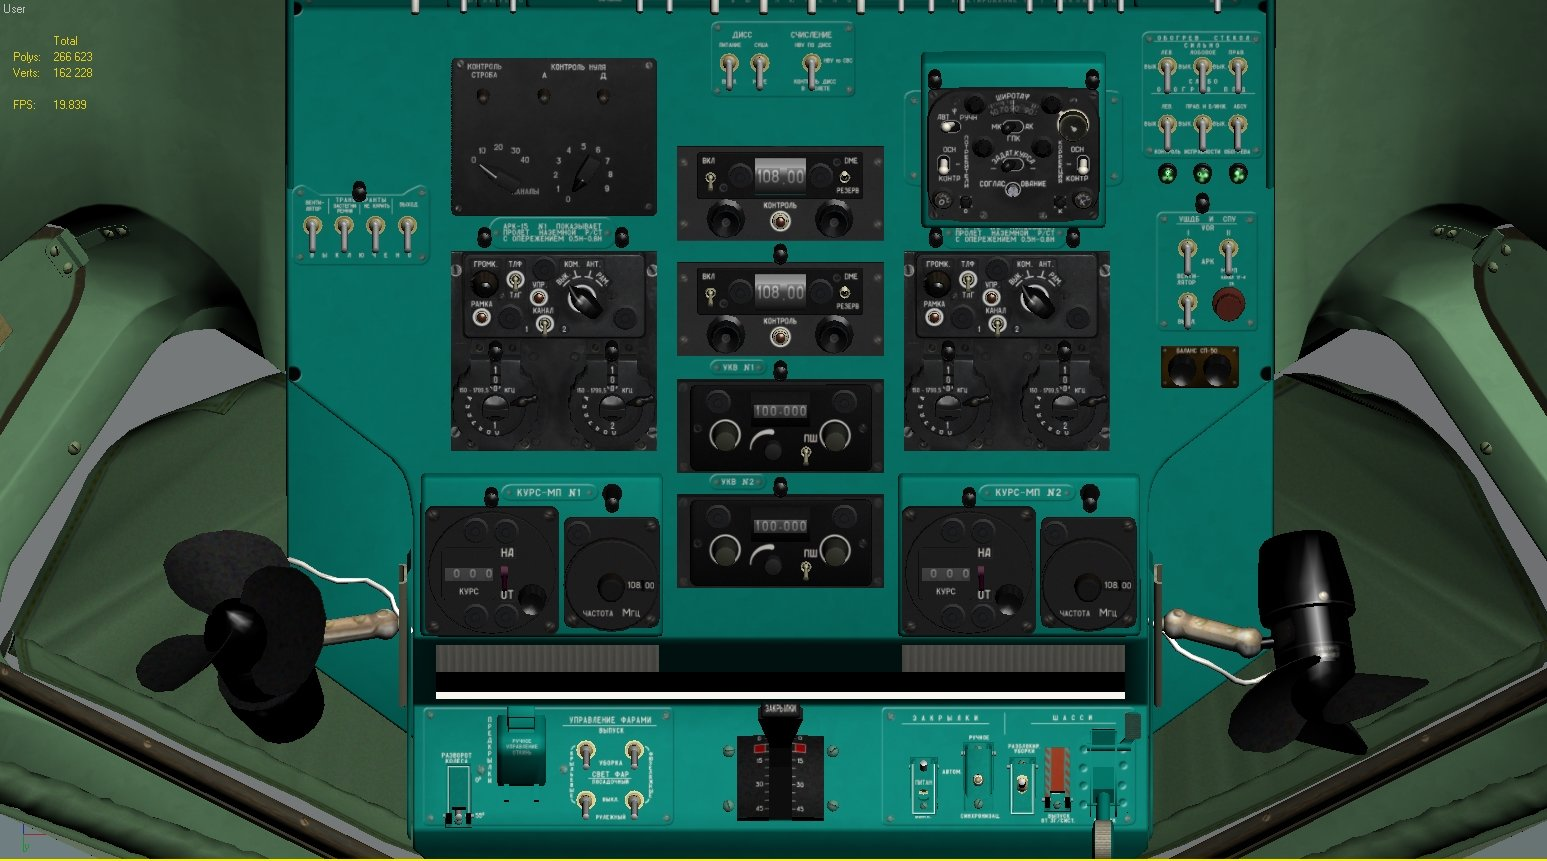 1565190945_2019-04-2001_57_24-Tu-154_B2_VC487.max-ProjectFolder_D__Documents_3dsmax-Autodesk.jpg.34eb67612af5377701ee26d35e00cb40.jpg